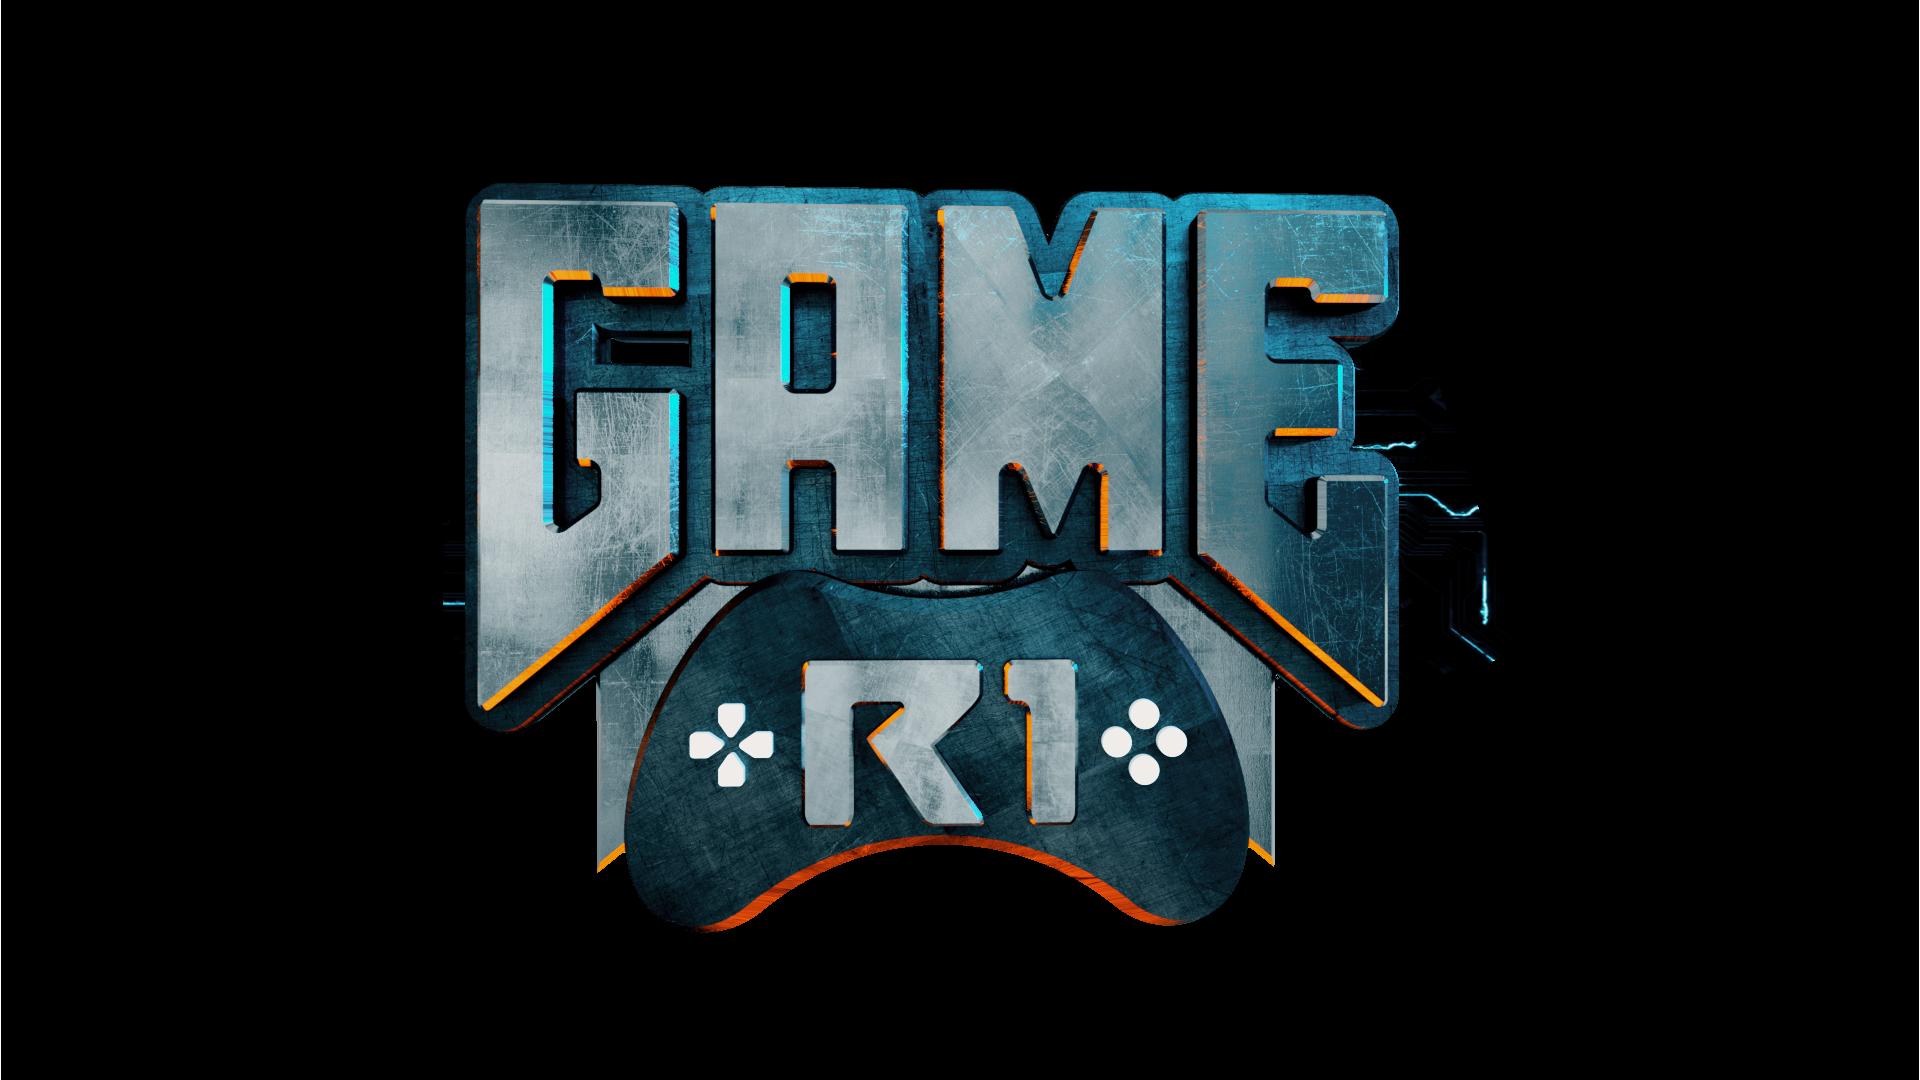 """Game R1"": Η νέα εκπομπή αφιερωμένη στον κόσμο του gaming, σε παραγωγή COSMOTE TV"